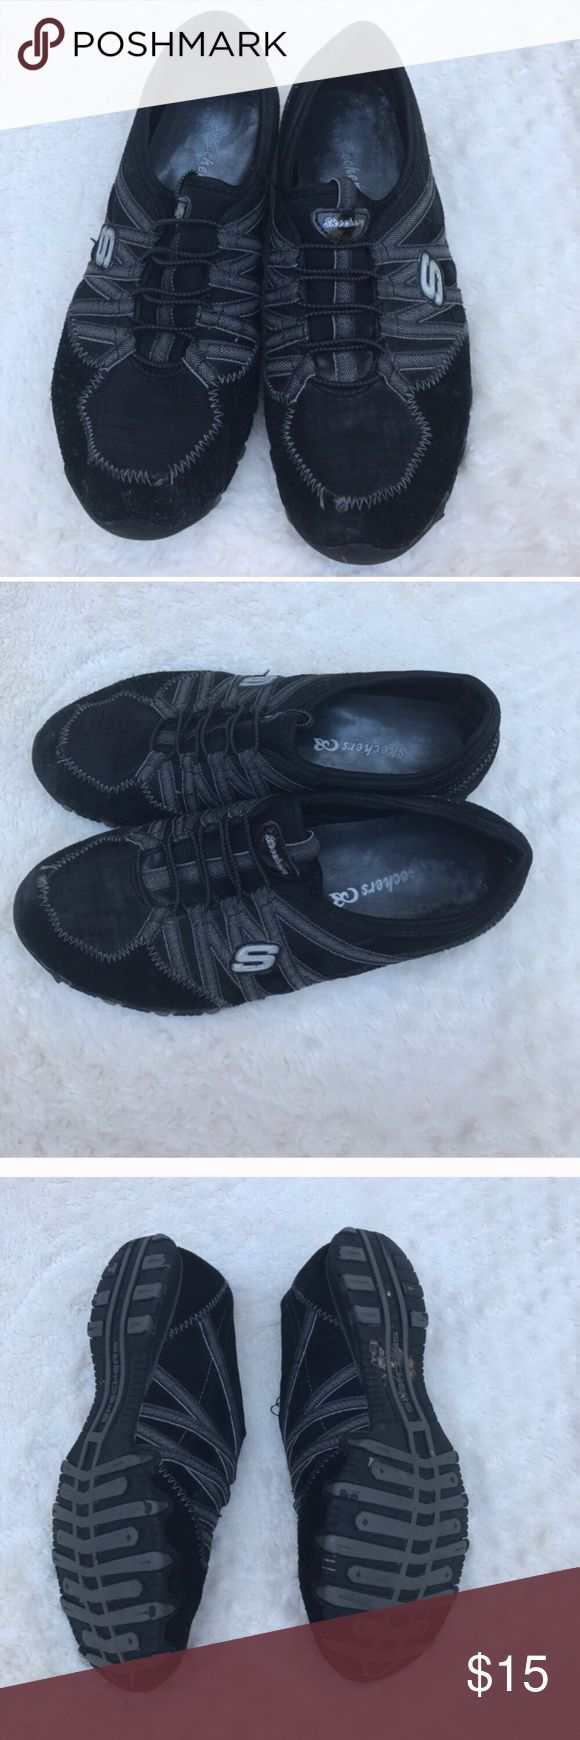 Size 8 black Skechers slip on shoes Size 8 black Skechers shoes Skechers Shoes Sneakers